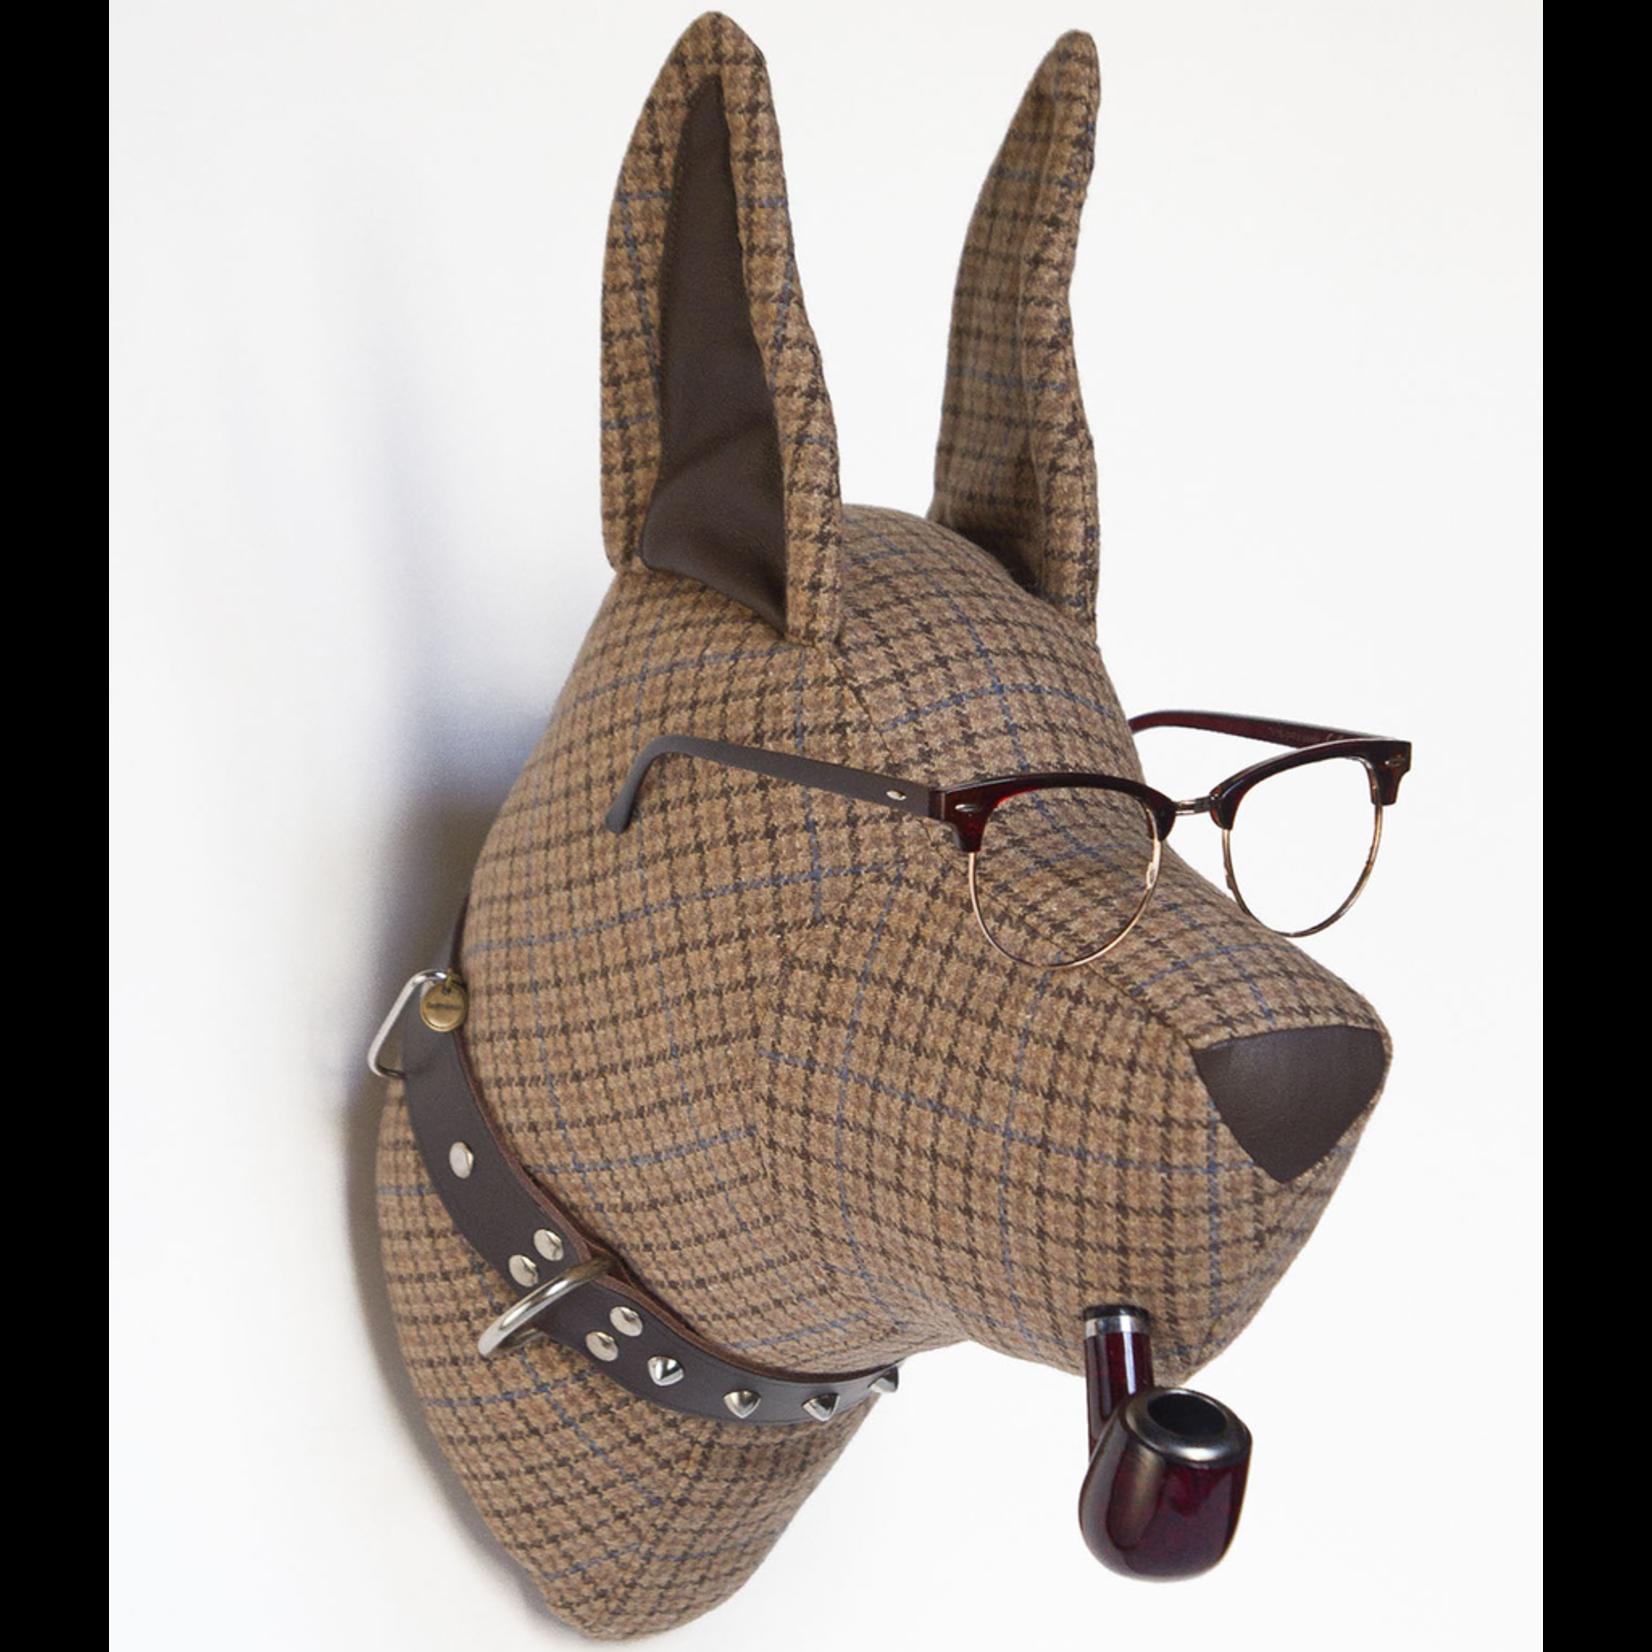 SOFTHEADS SOFT DOGO CARSON (GLASSES + PIPE)